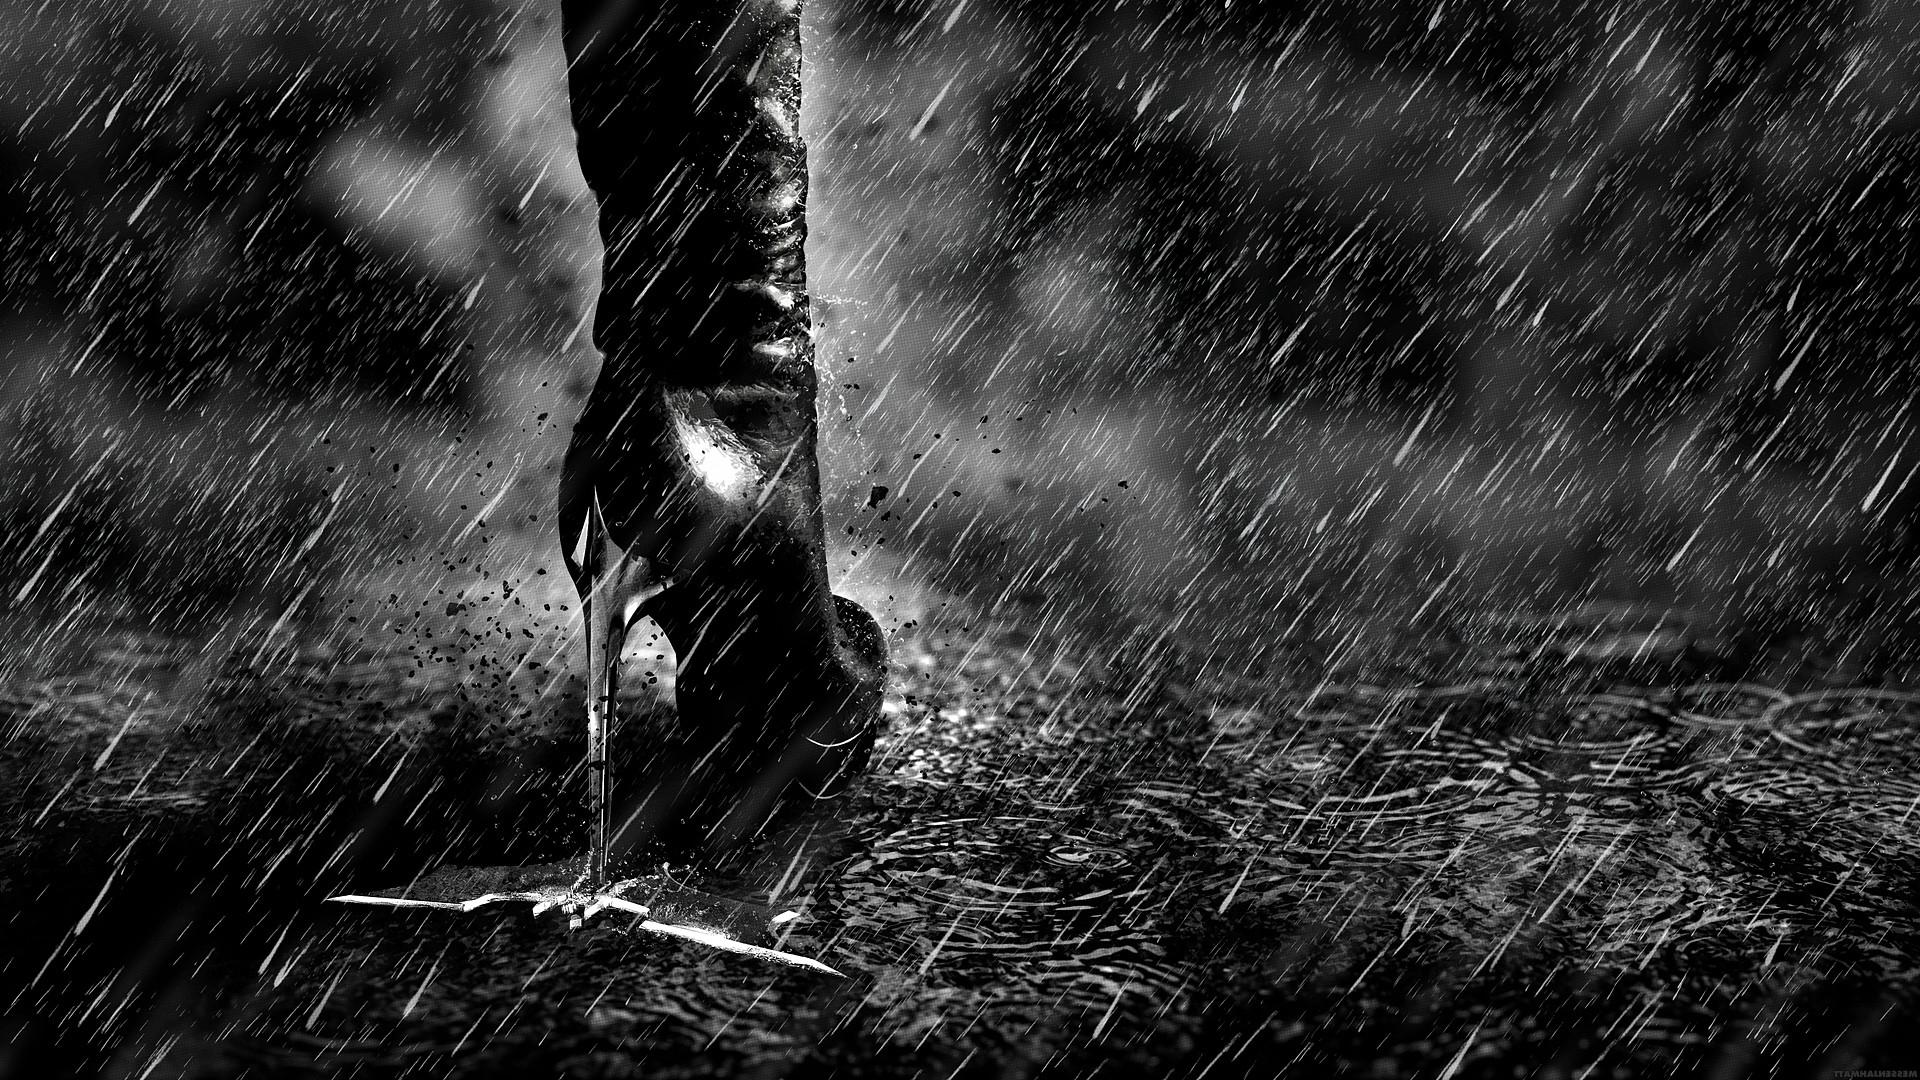 1920x1080 Px Artwork Batman Catwoman Dark Heels High Knight Legs Logo Rain Rises